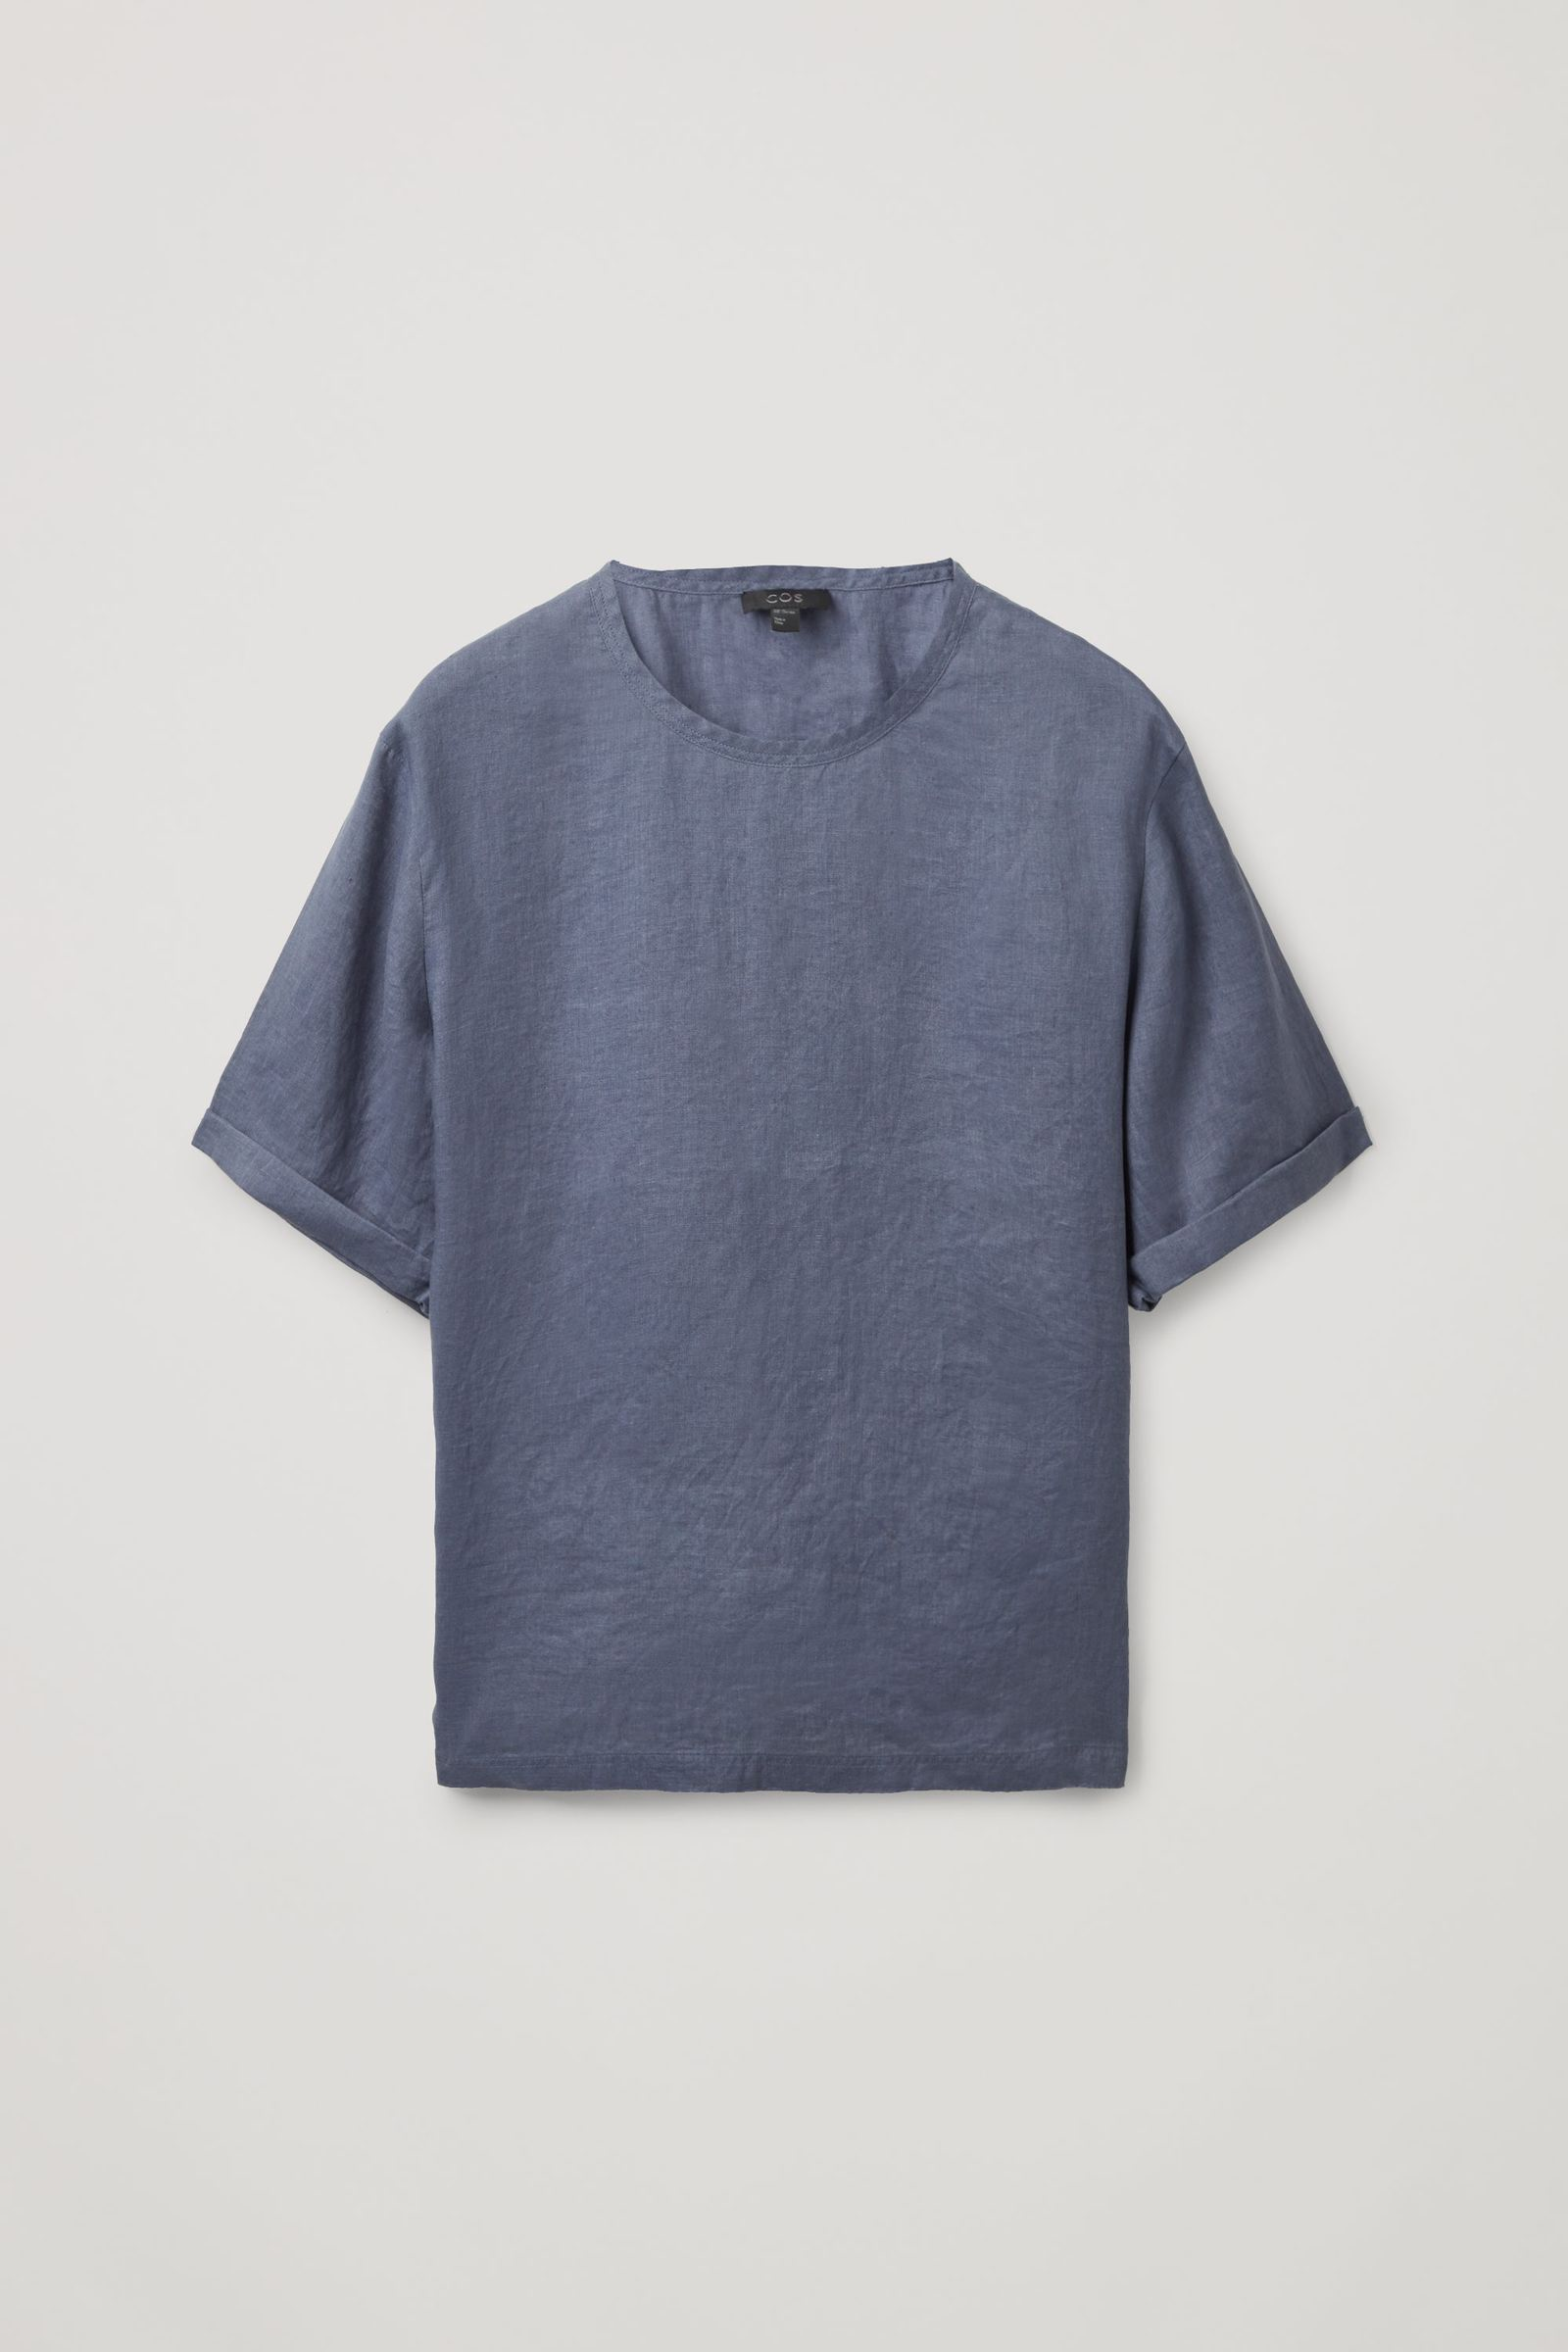 COS 릴랙스드 핏 헴프 티셔츠의 블루컬러 Product입니다.